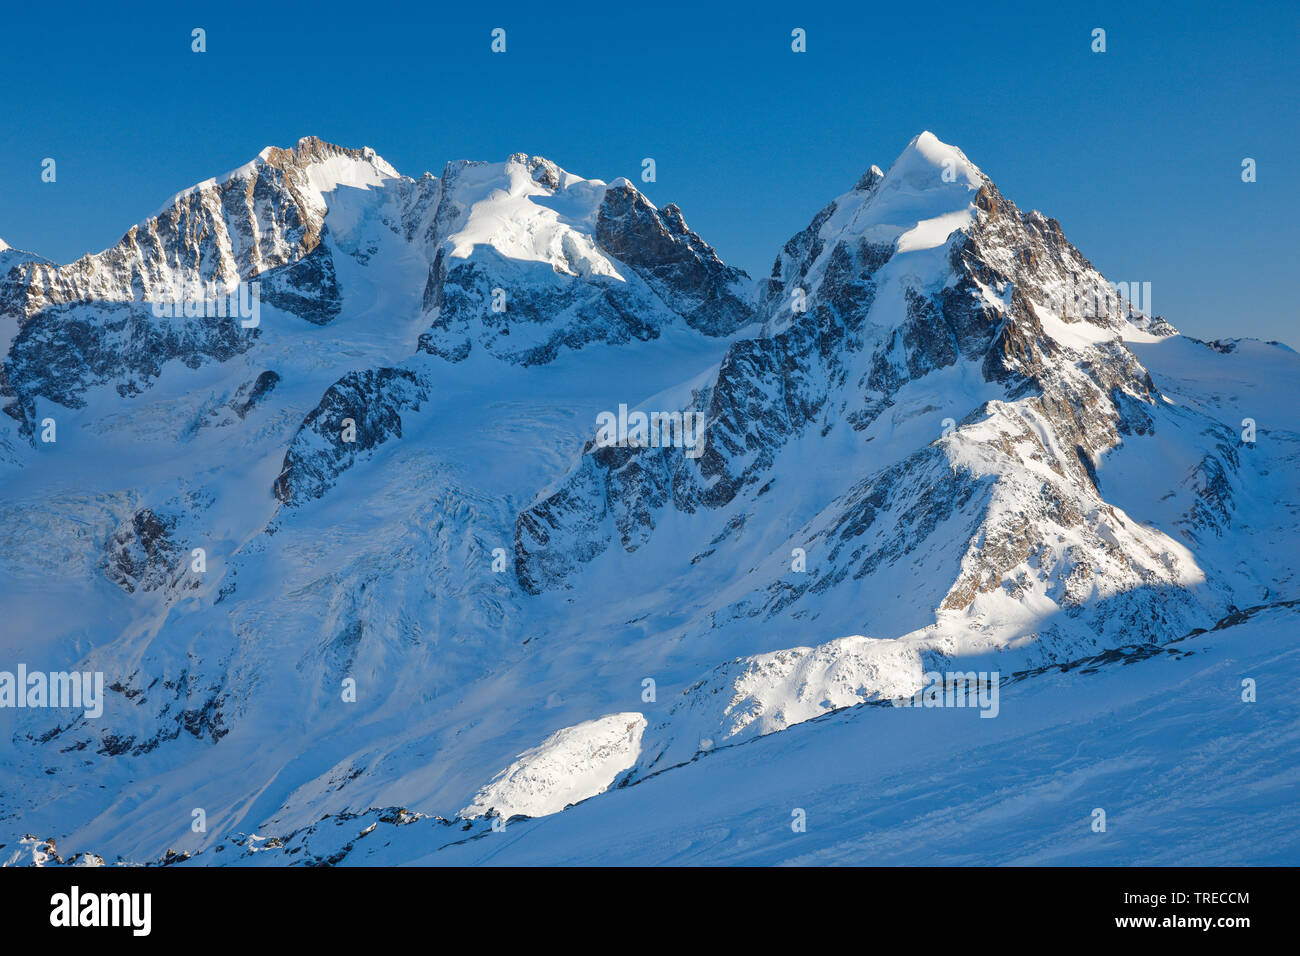 Biancograt mit Piz Bernina-4049 m, Piz Scerscen - 3971 m, Piz Roseg-3937 m, Schweiz, Graubuenden, Oberengadin   Biancograt with Piz Bernina-4049 m, Pi - Stock Image